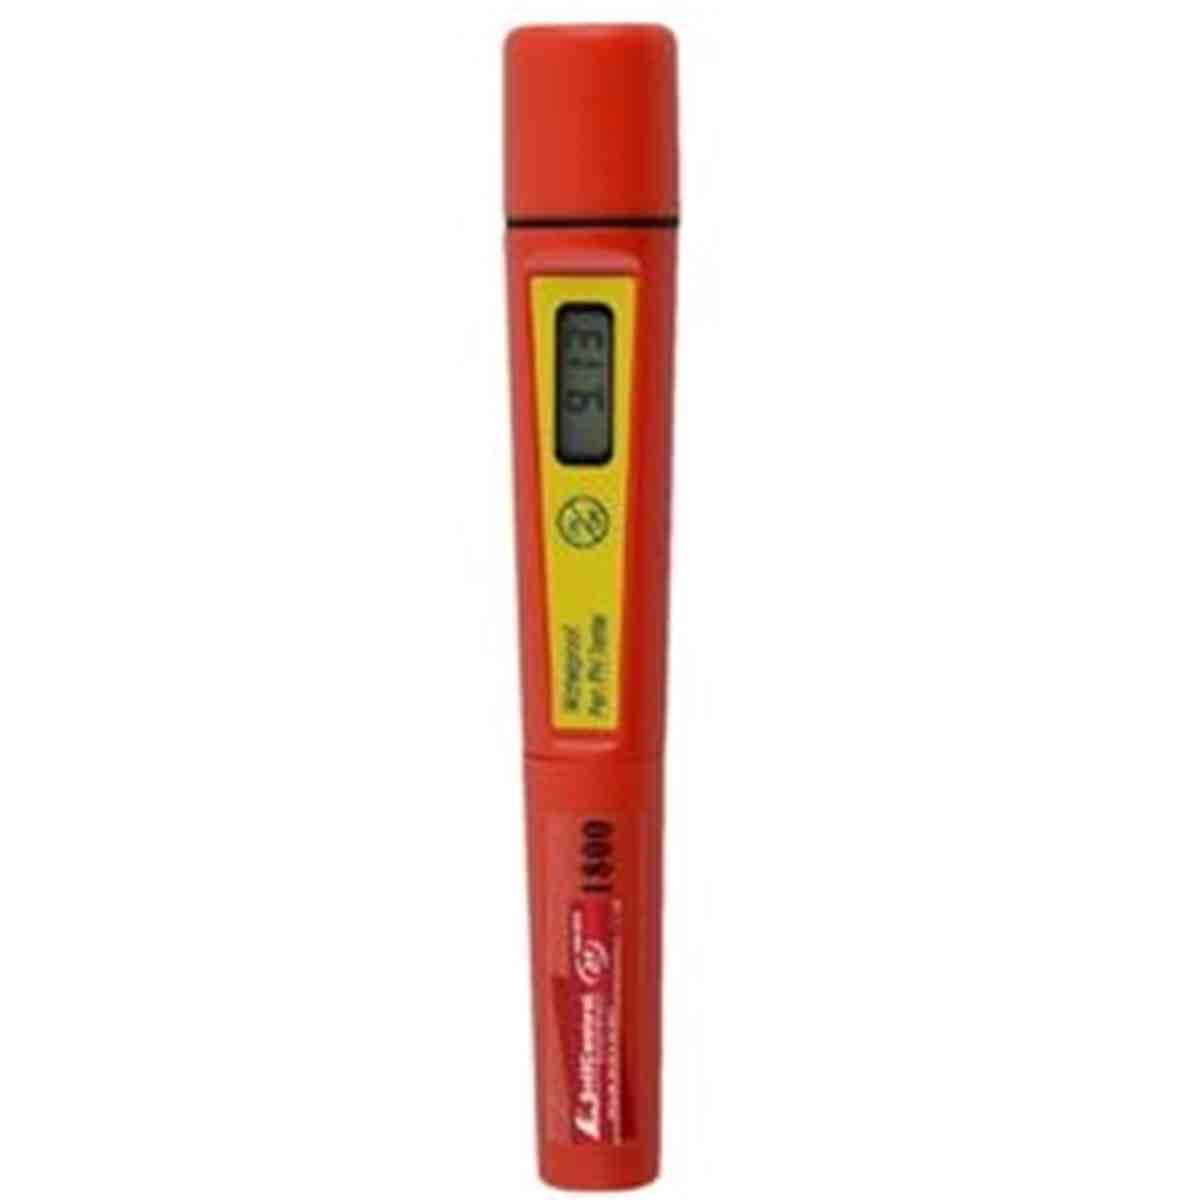 Medidor de pH portátil à prova d'água *